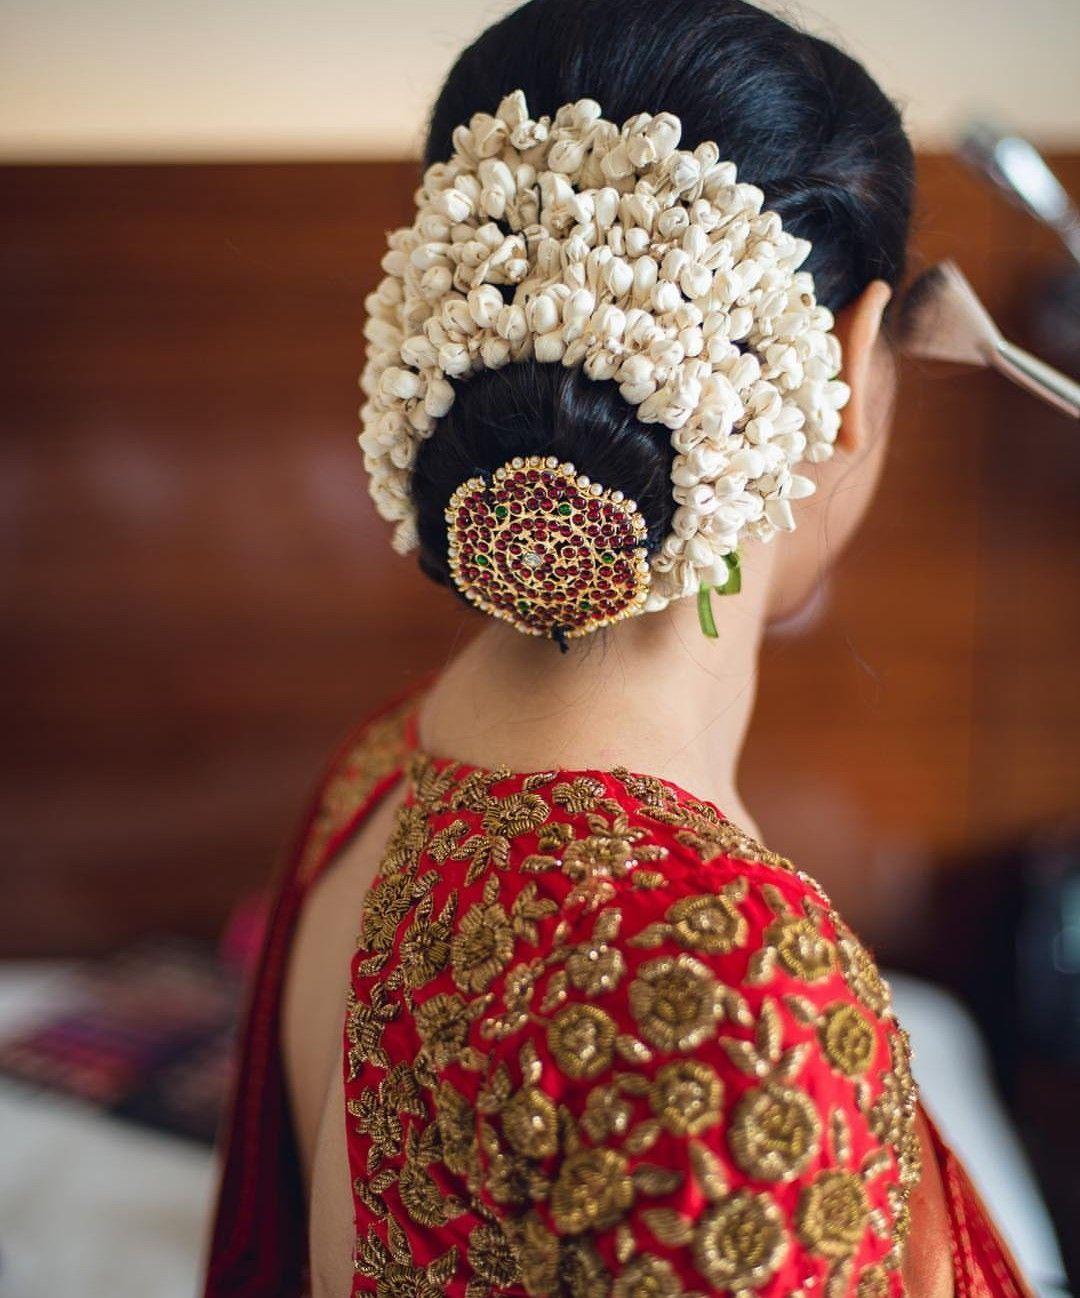 New Wedding Bun Hairstyle Indian 2021 South Indian Wedding Hairstyles Bridal Hair Brooch Wedding Hairstyles For Medium Hair